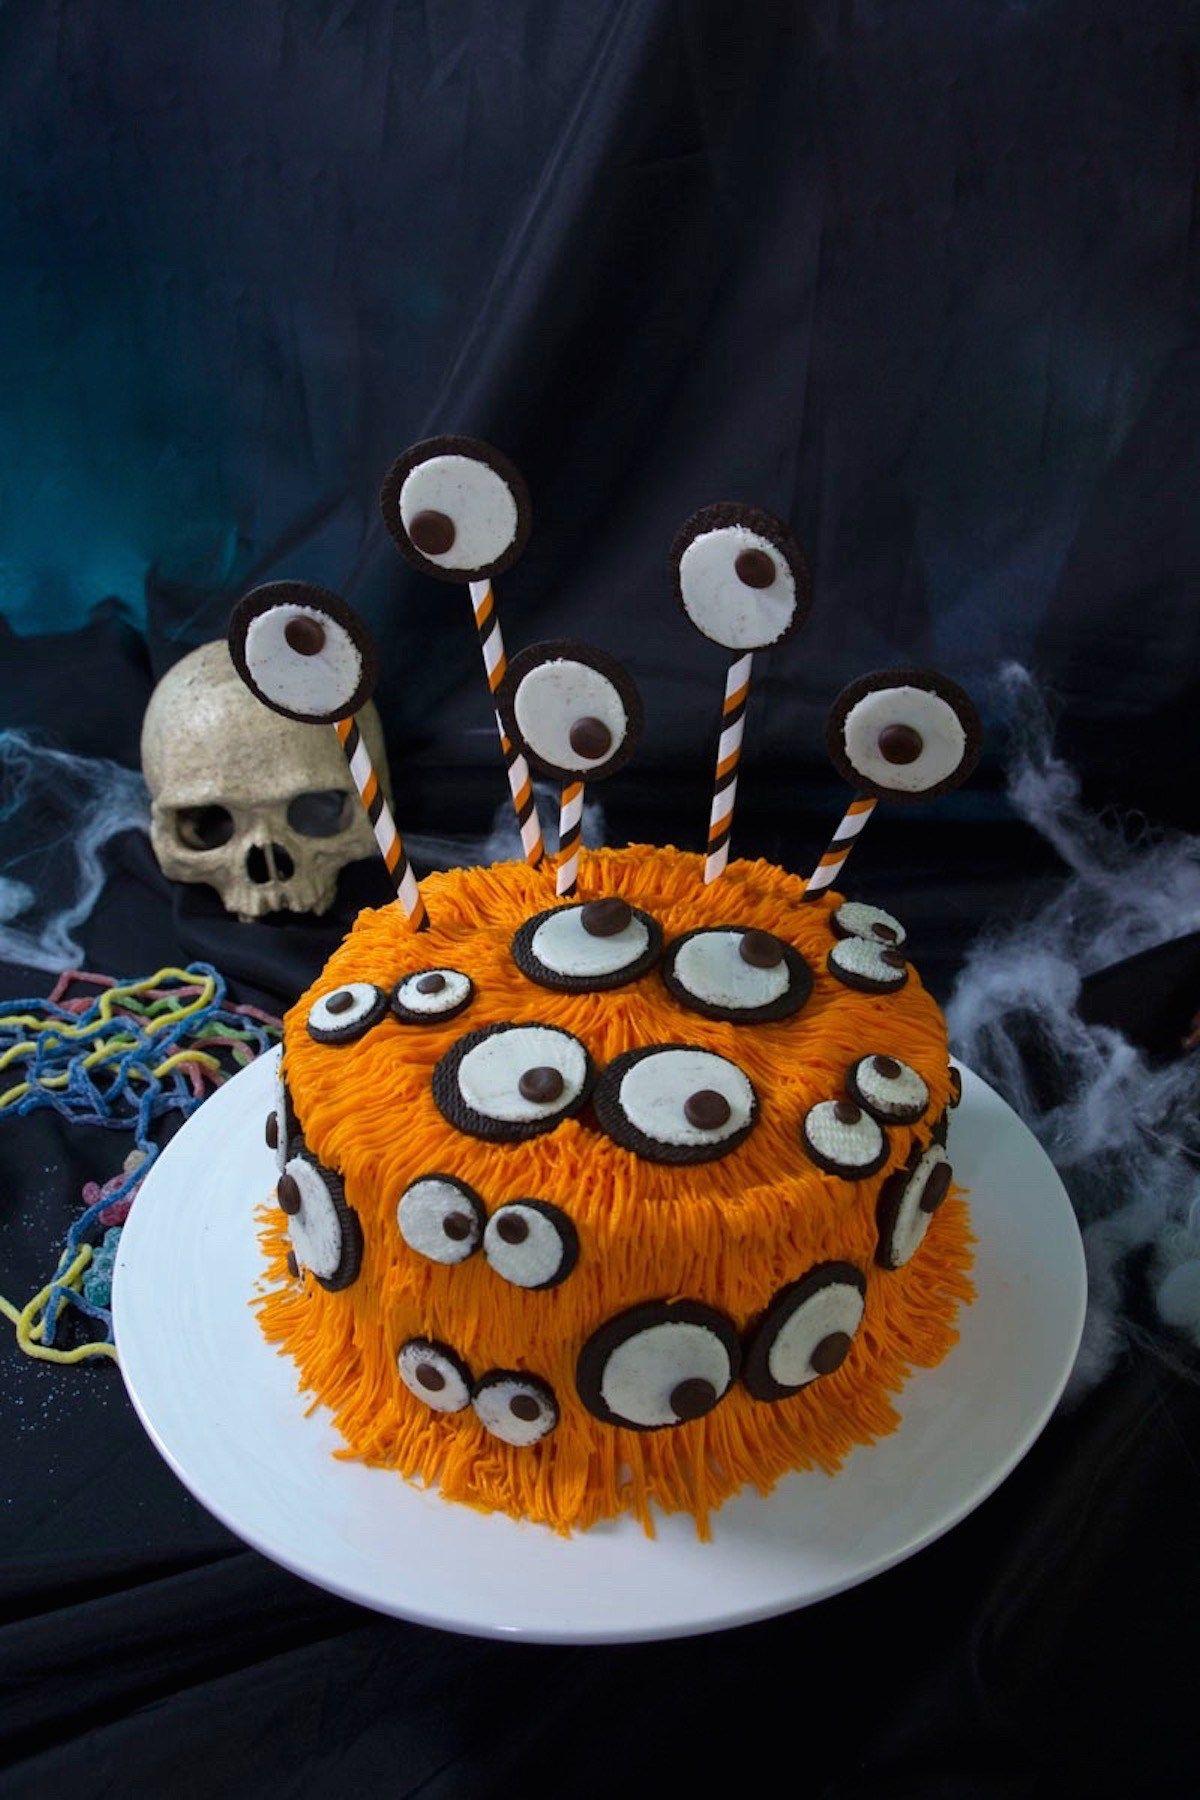 Halloween monster cake with oreos eyes halloween pinterest recette glacage gateau - Recette de gateau d halloween ...